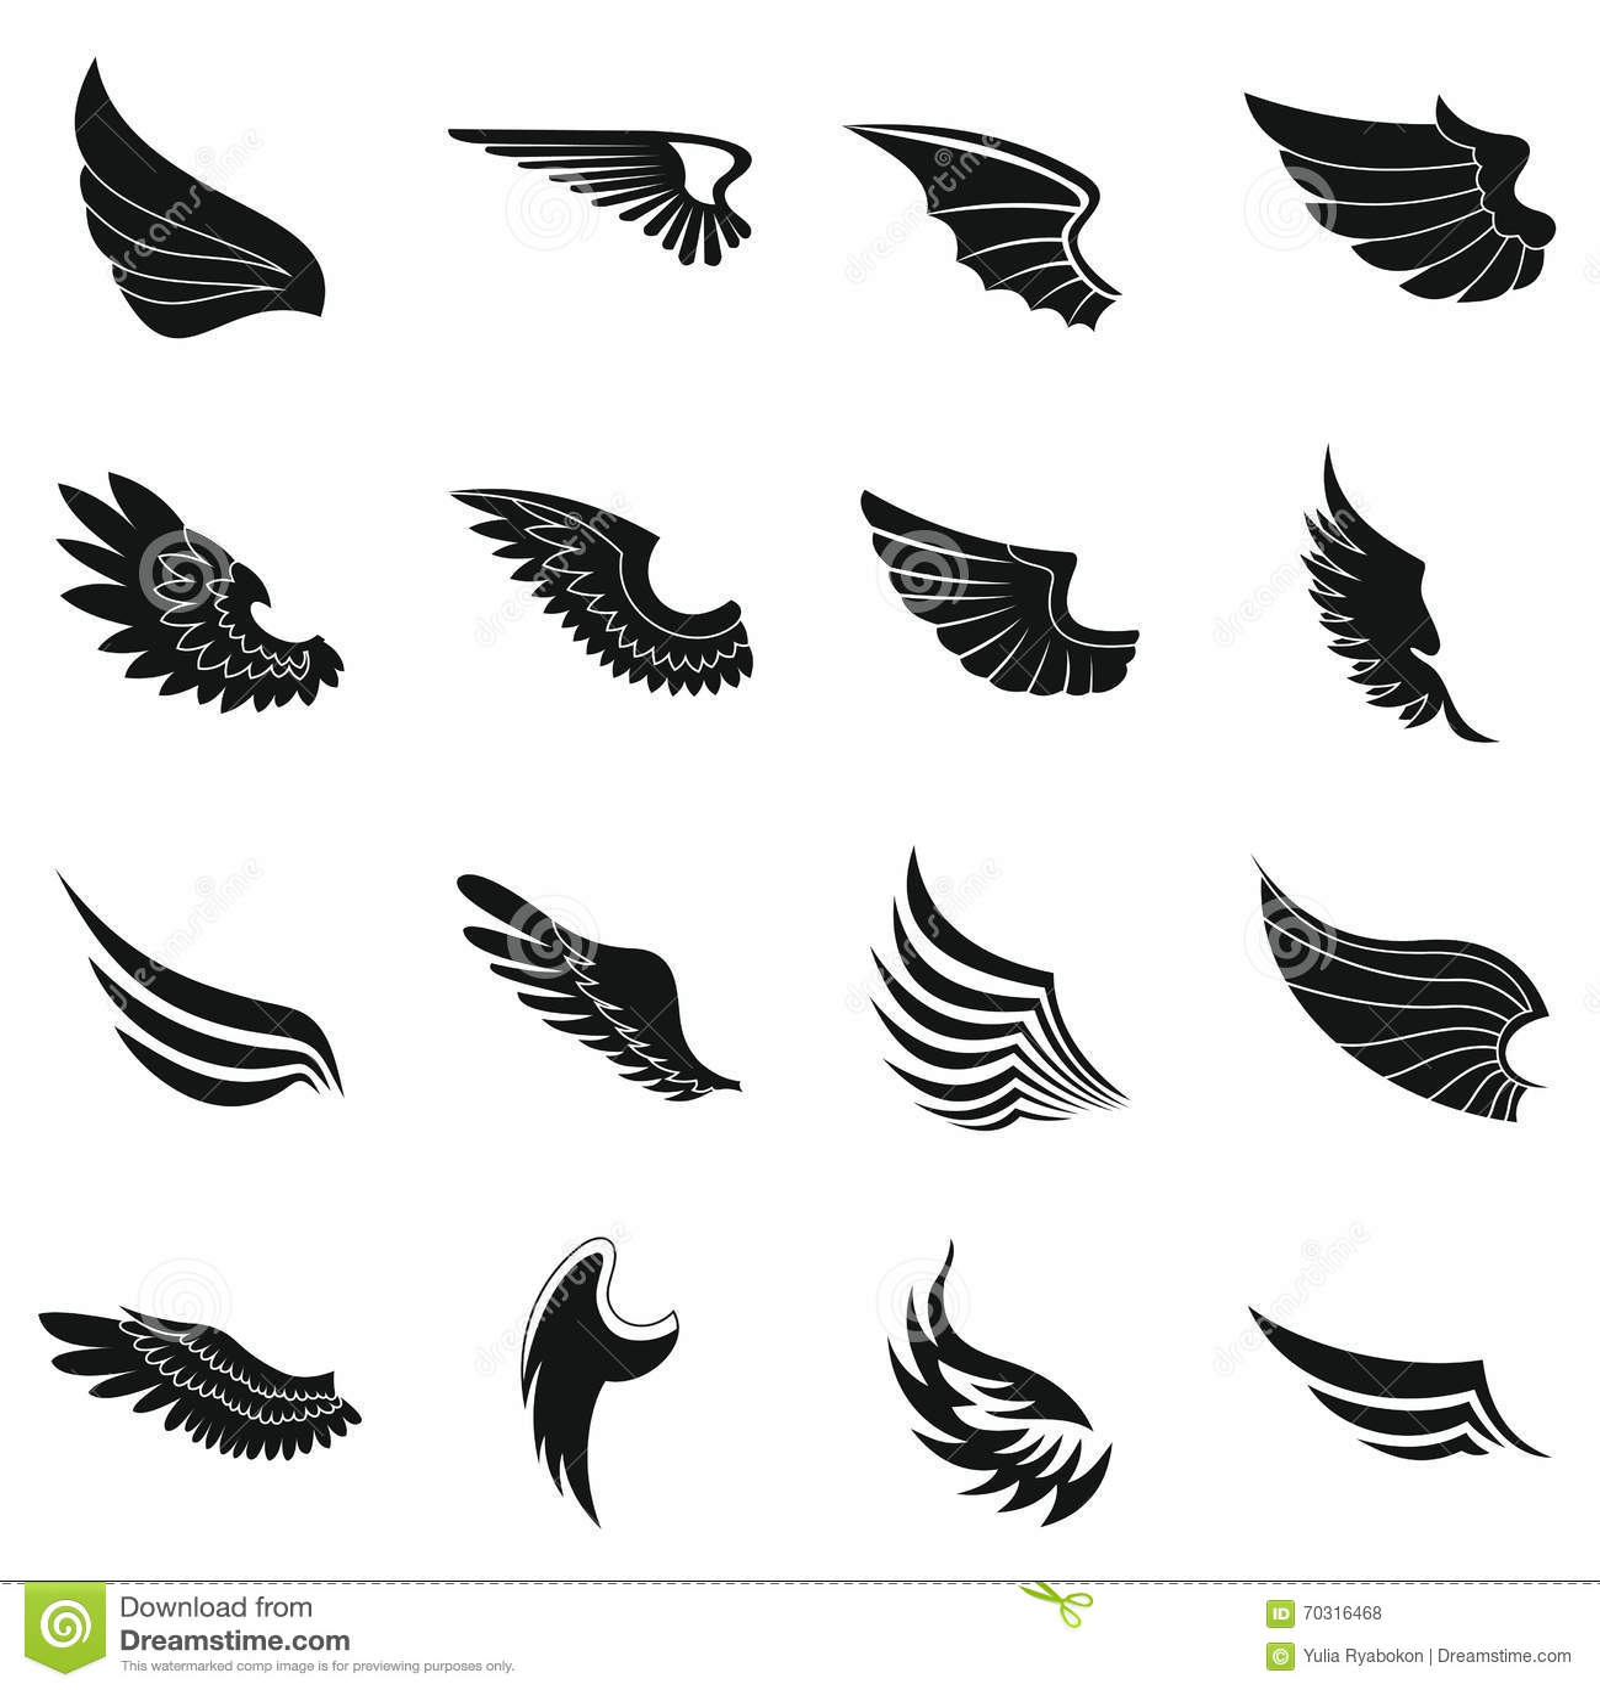 Iconos fijados, estilo simple negro de las alas